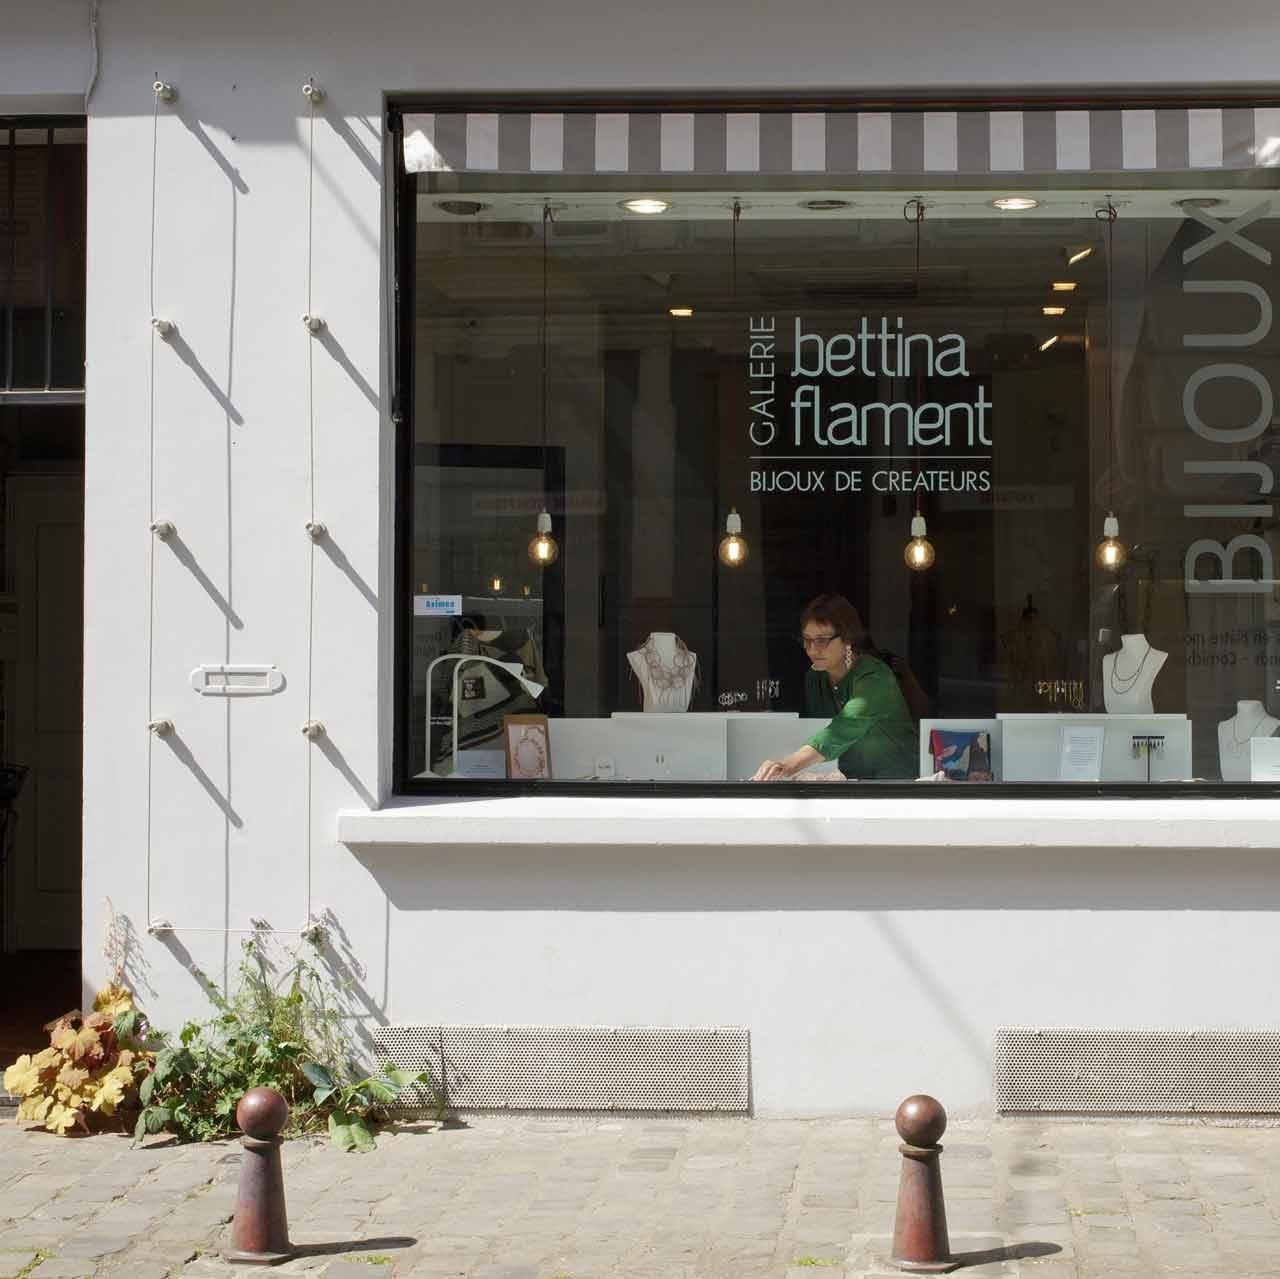 Galerie Bettina Flament Lille